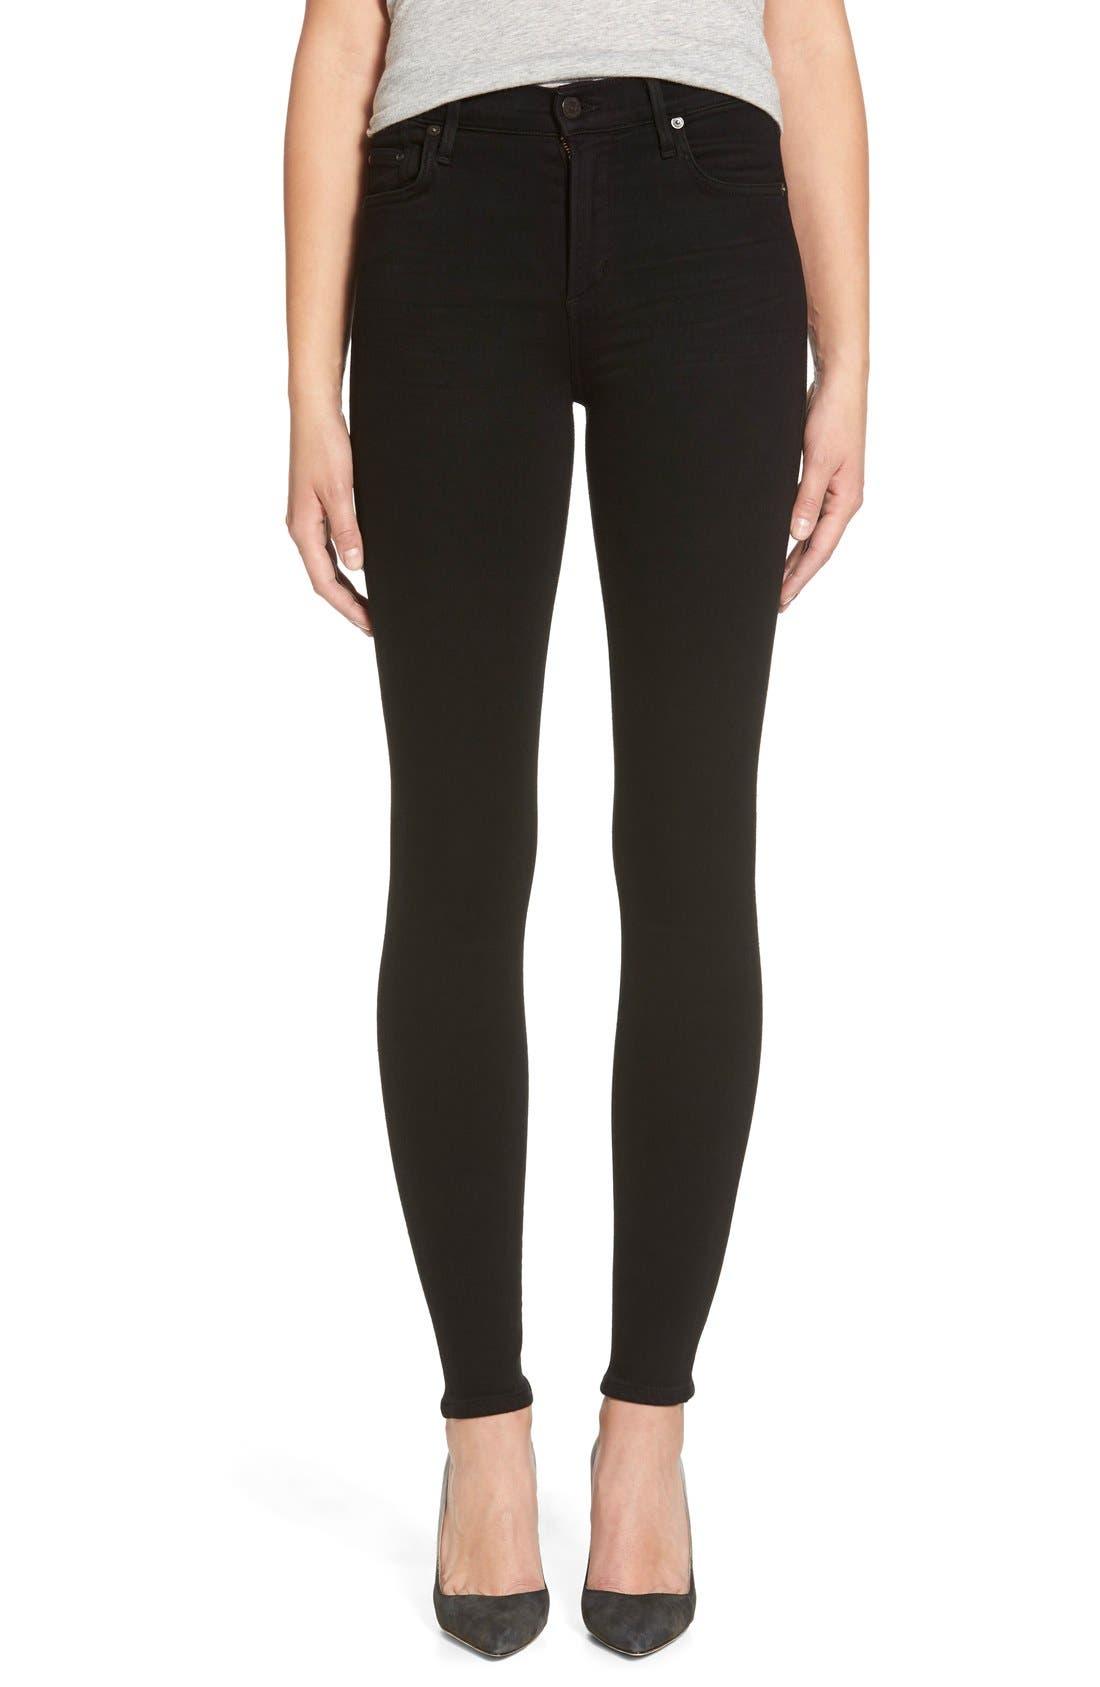 Rocket High Waist Skinny Jeans,                             Main thumbnail 1, color,                             Black